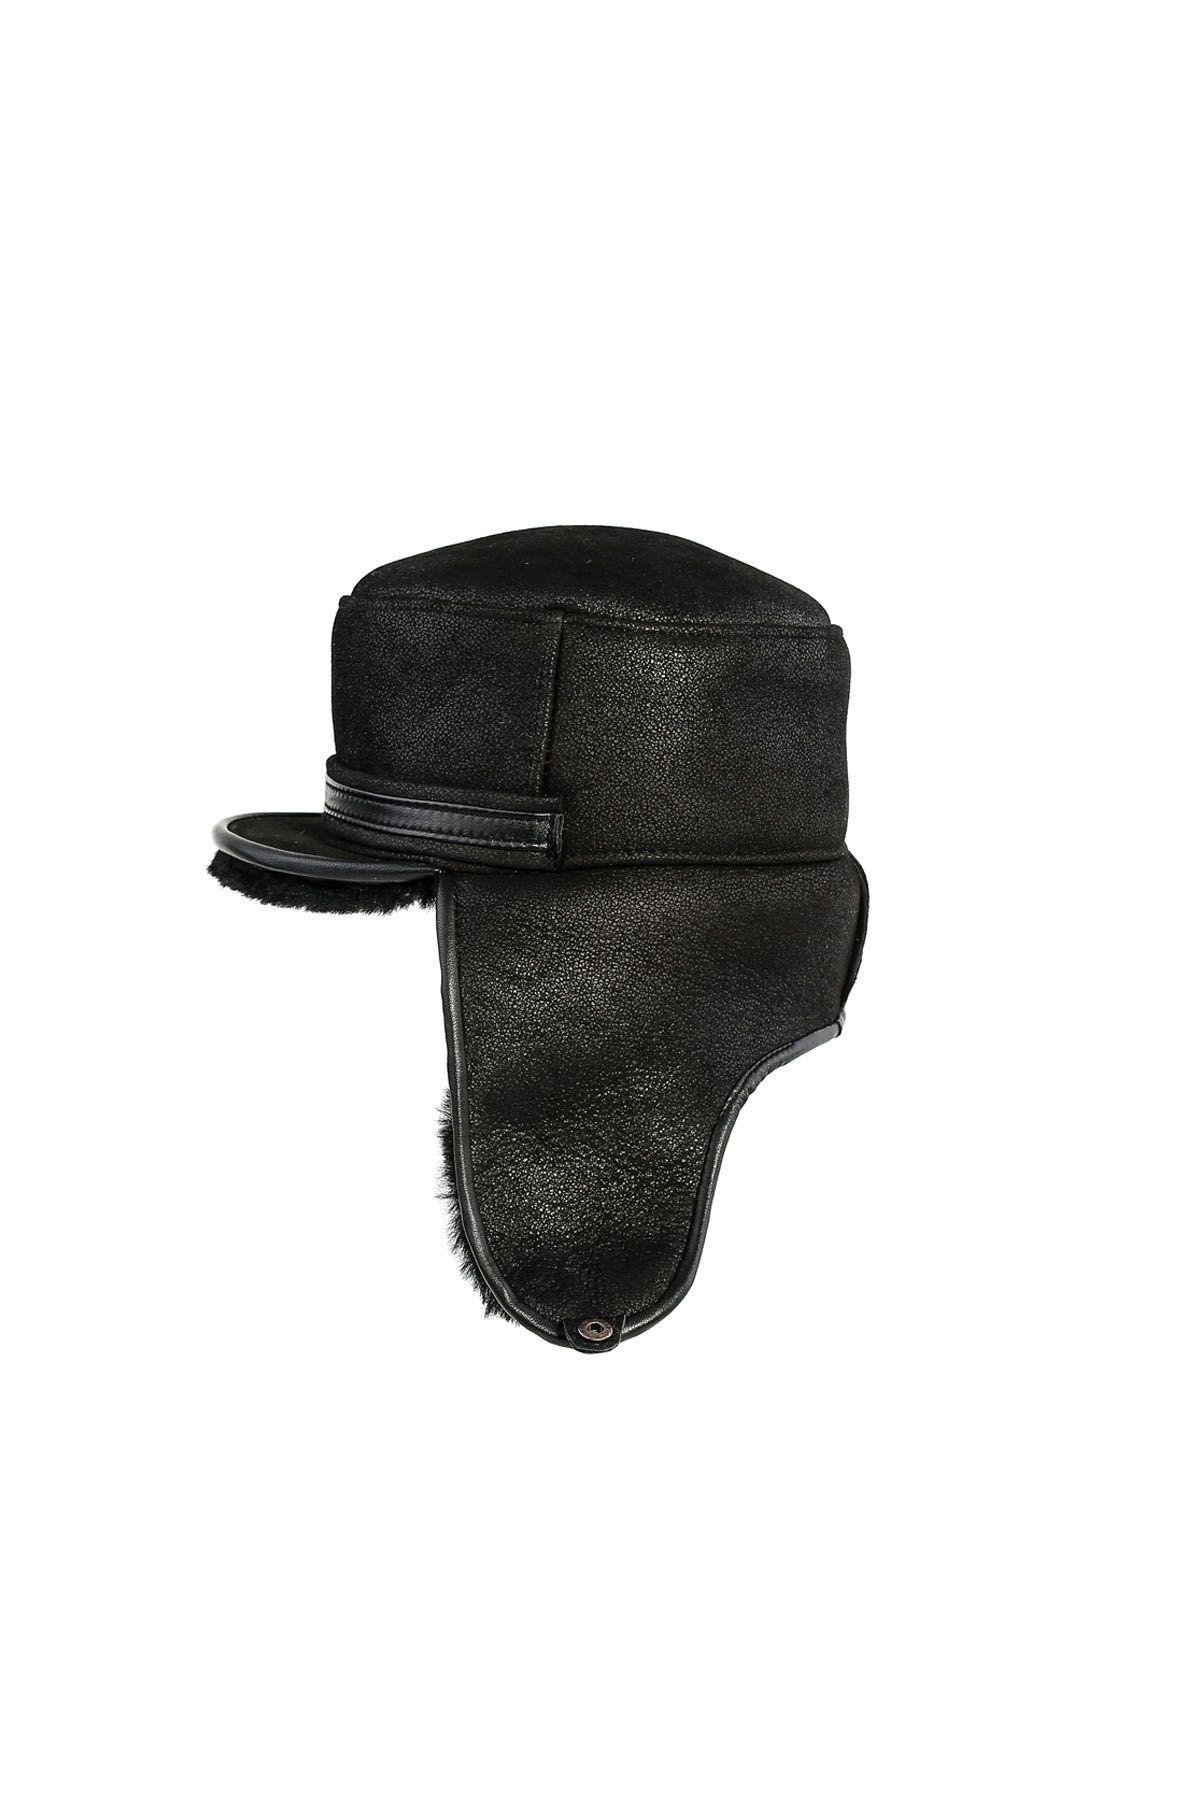 Pegia Hakiki Vintage Deri Kulaklıklı Şapka 18AS14 Siyah